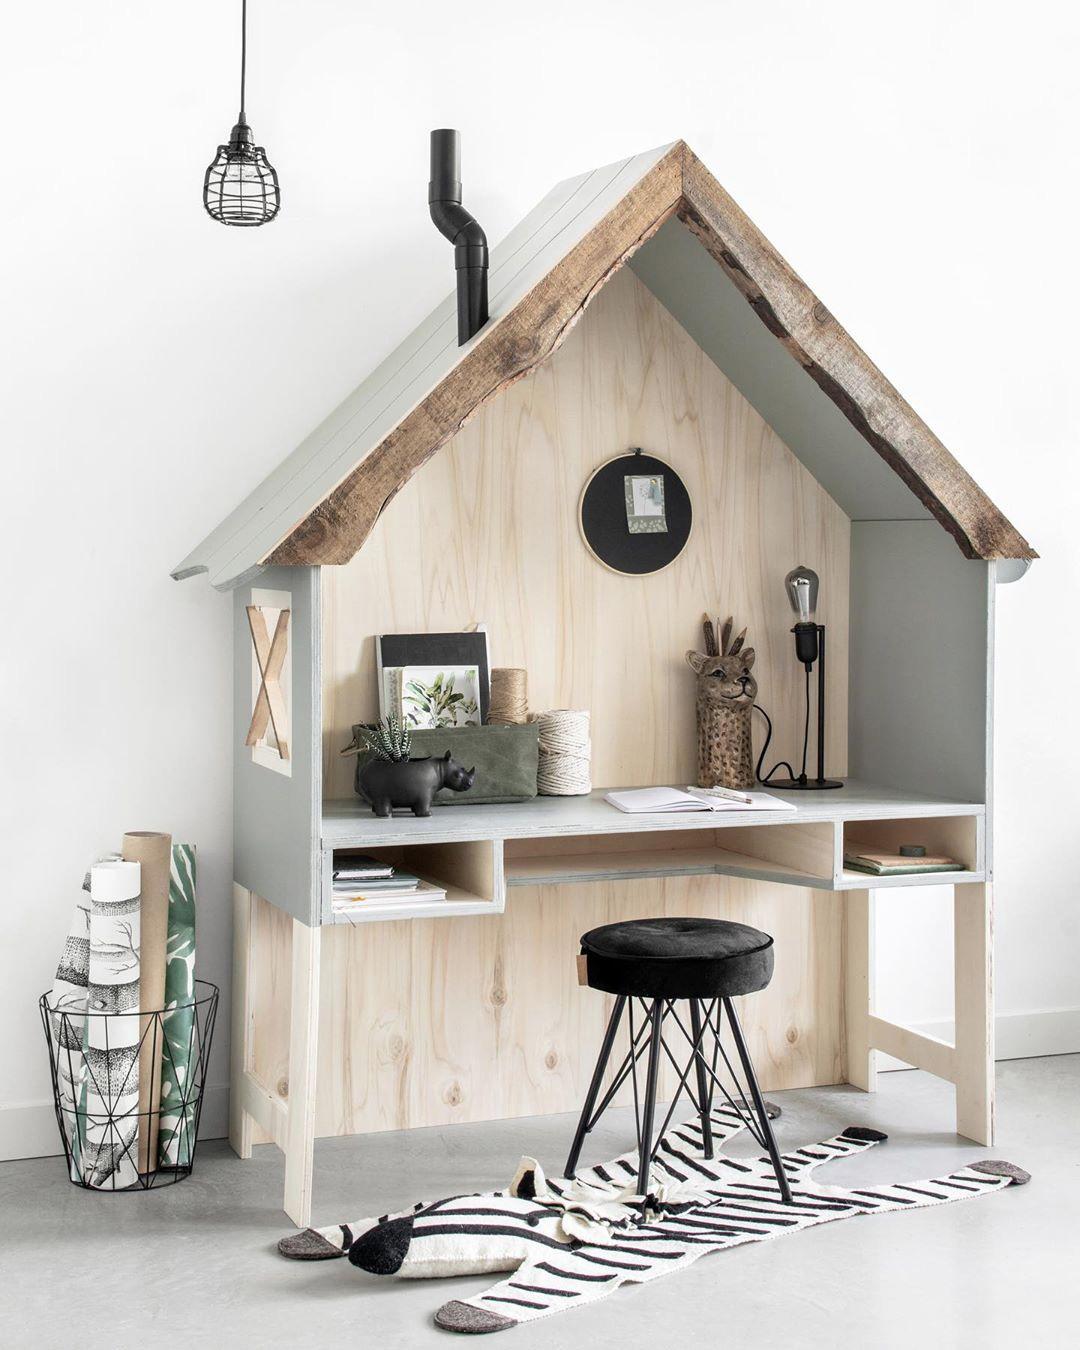 kid's desk in shape of house